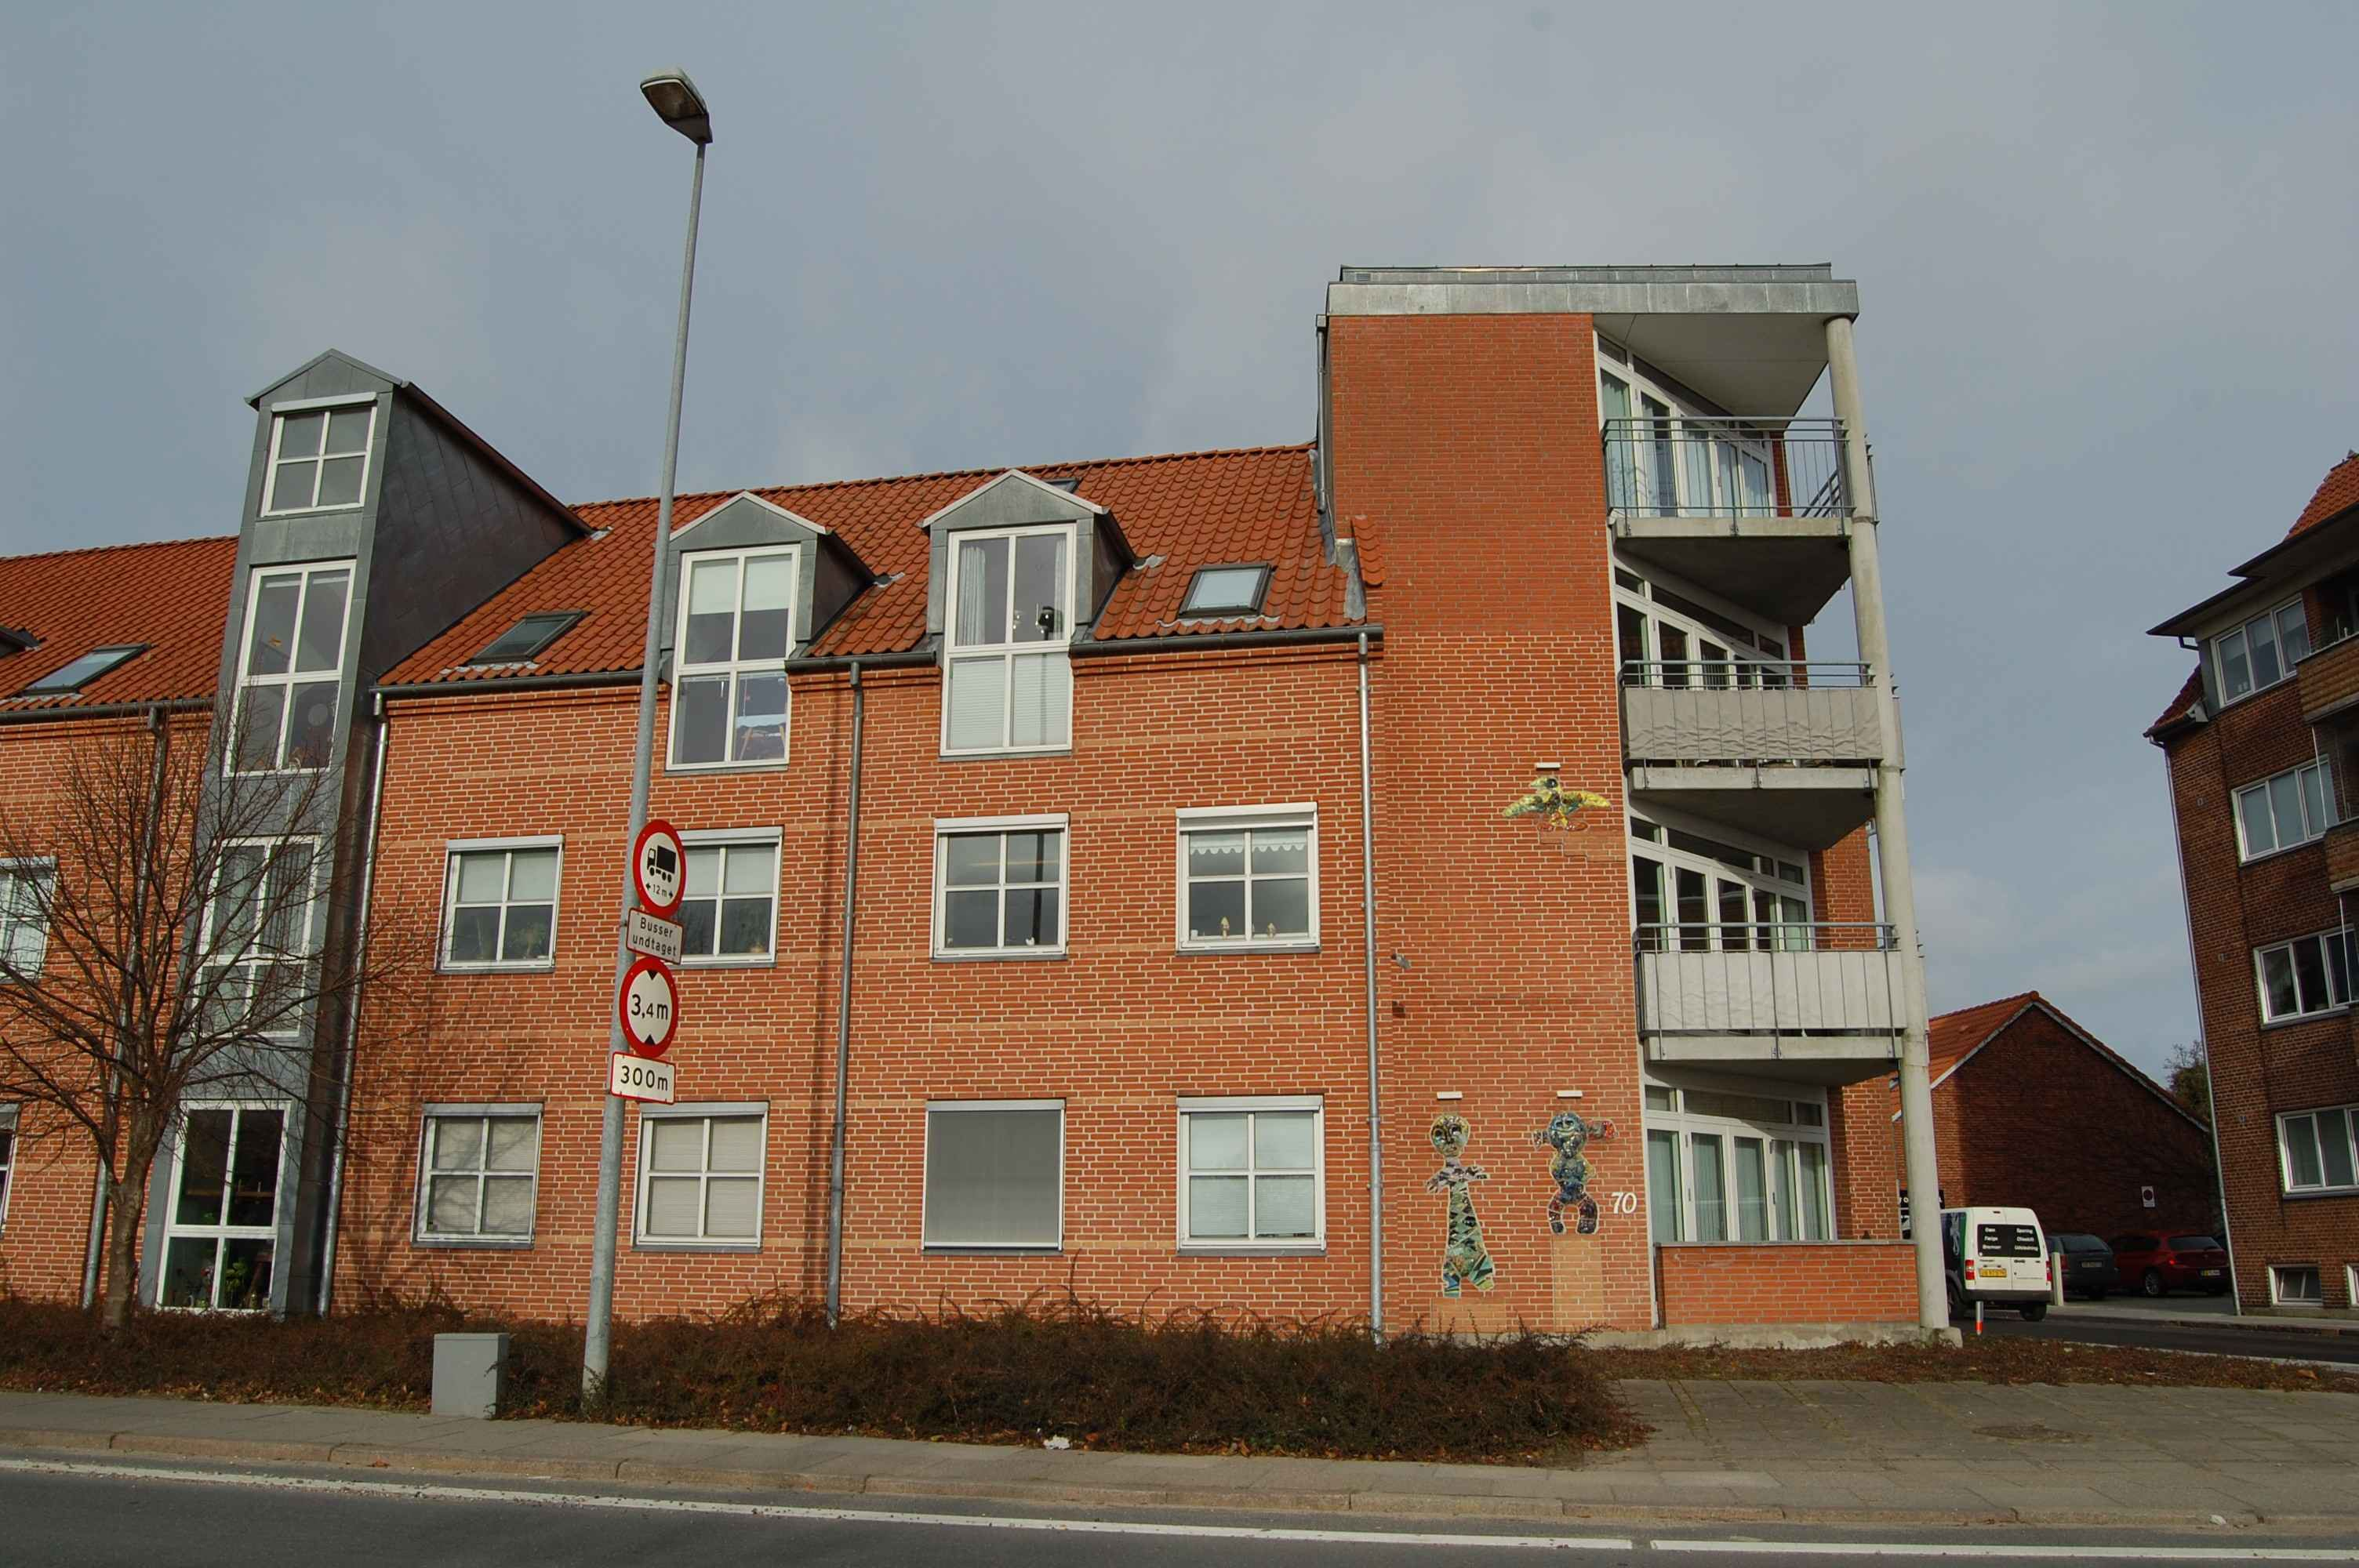 Drewsensvej 70 2 5, 8600 Silkeborg